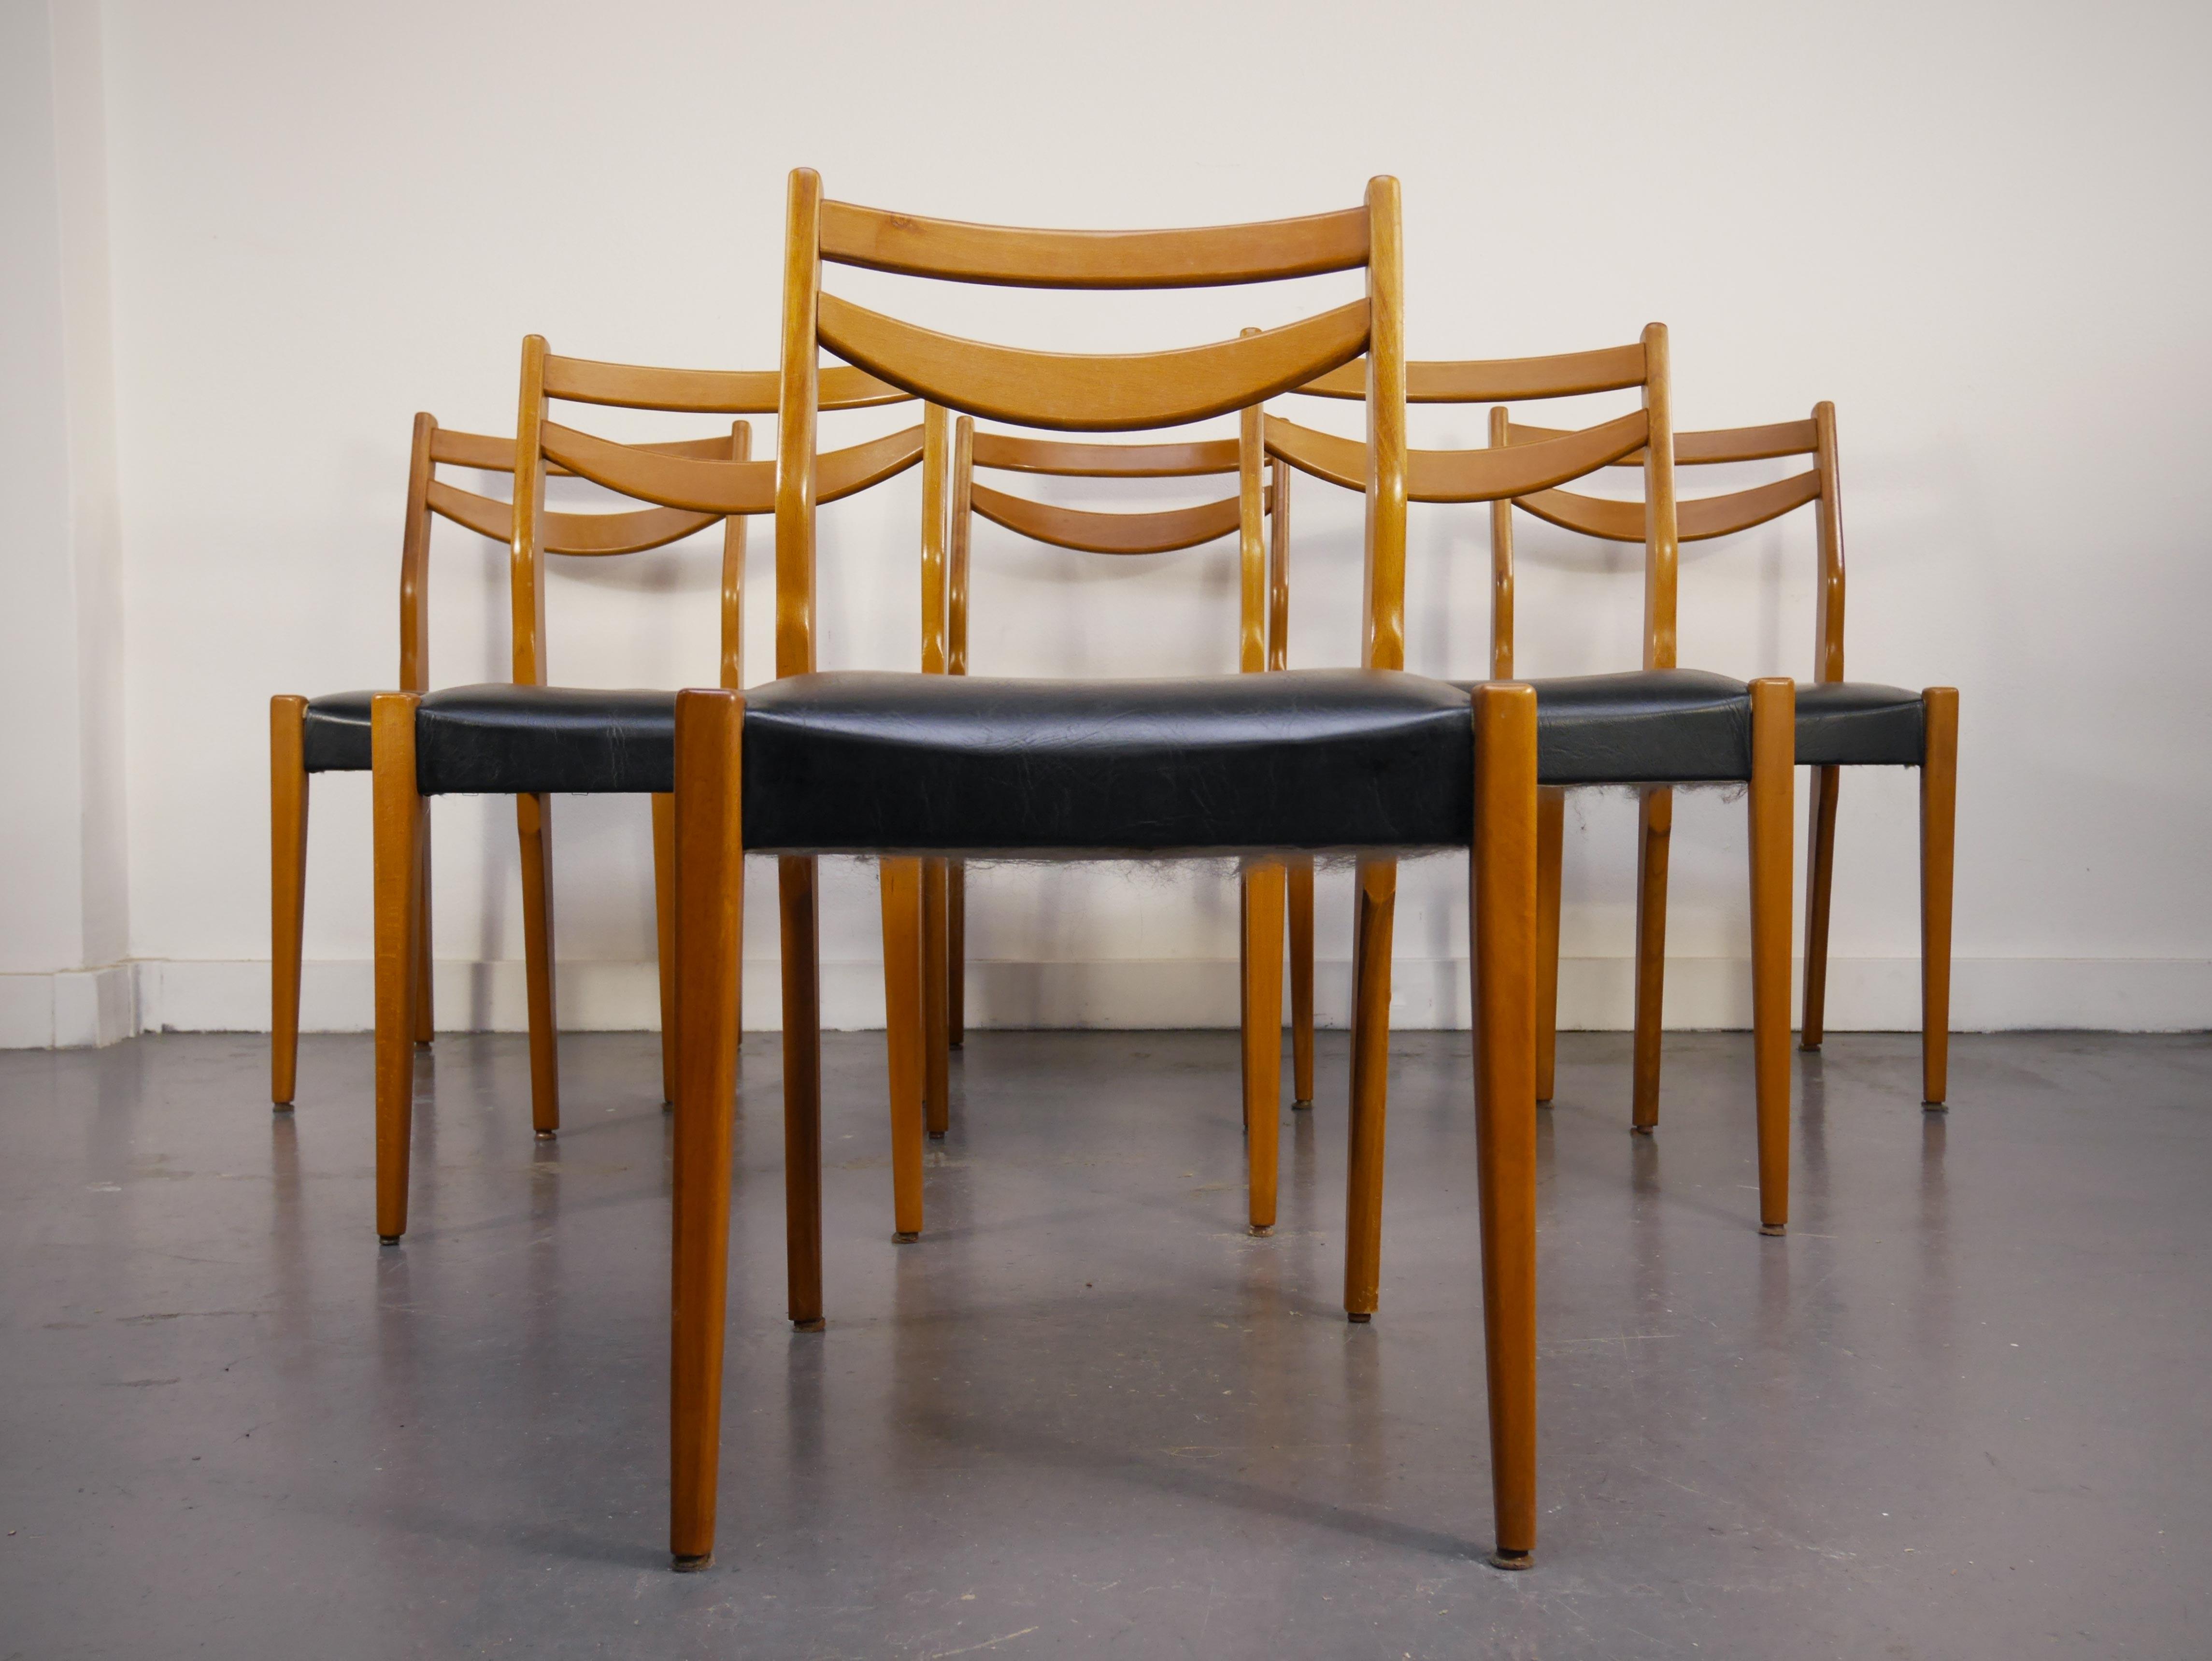 203lilipop vintage mobilier retro enfilade scandinave bureau vintage - Chaise Vintage Scandinave